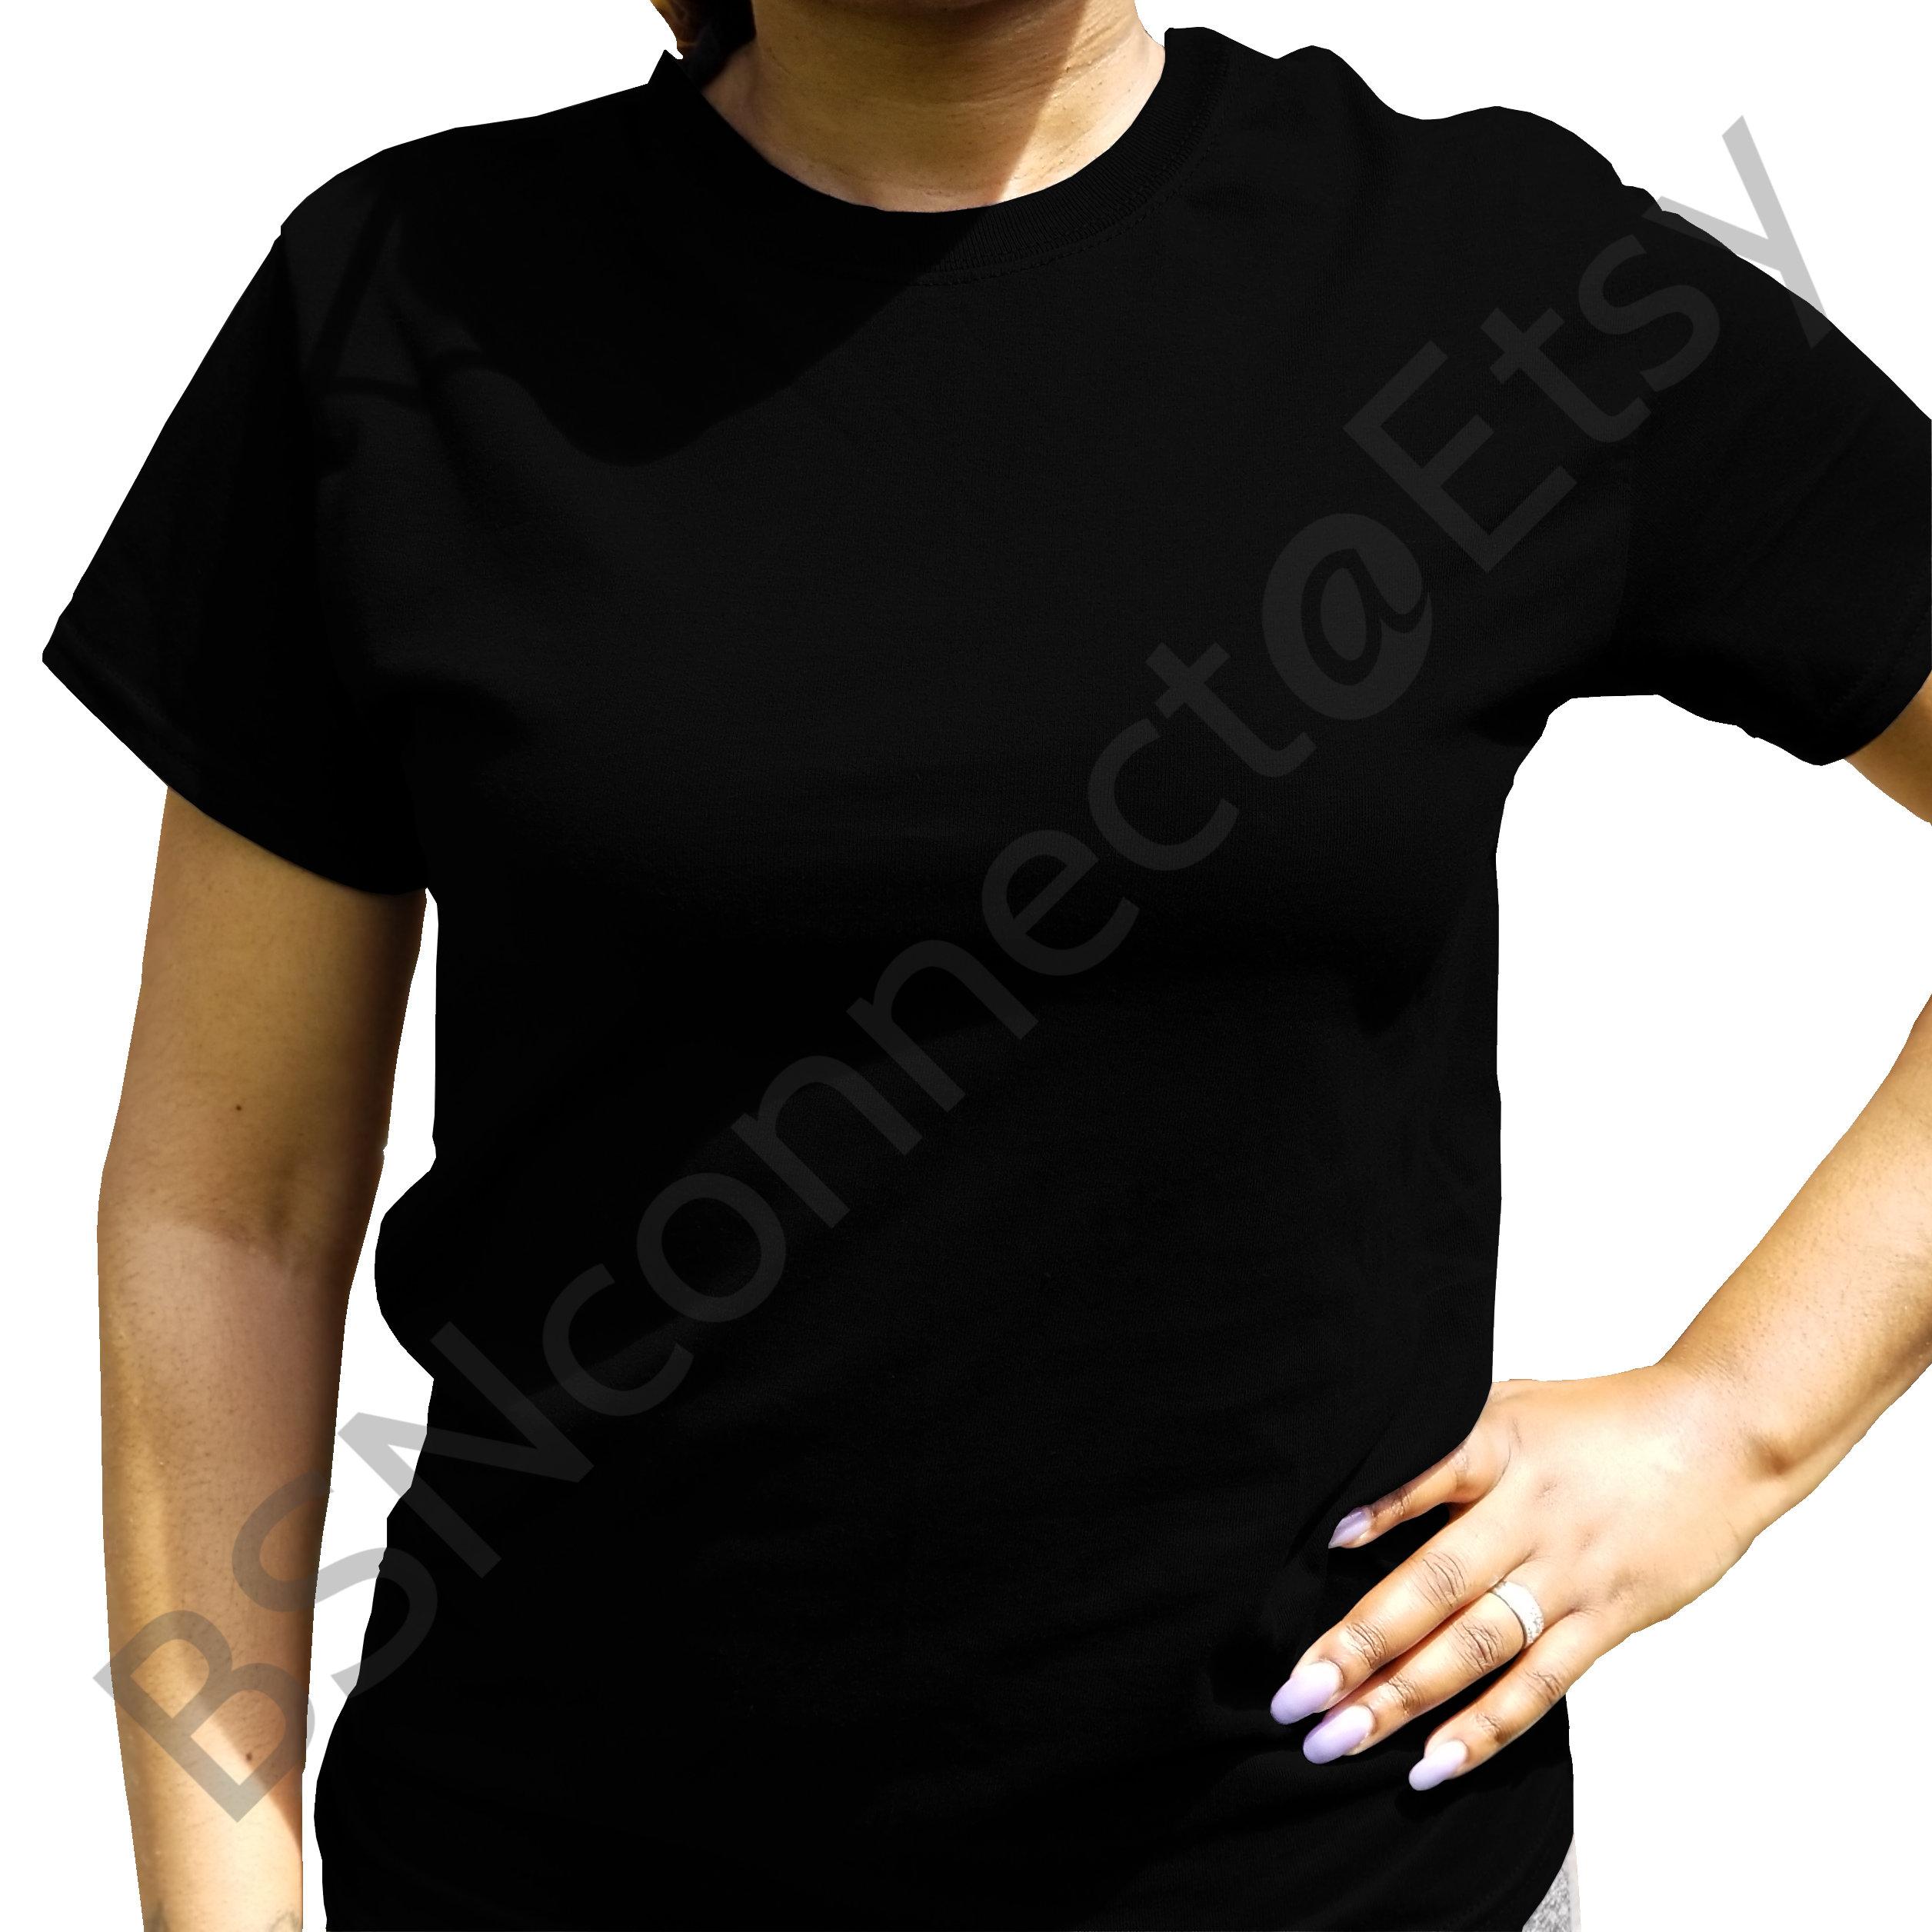 b2104be6 Blank Black T Shirts - DREAMWORKS